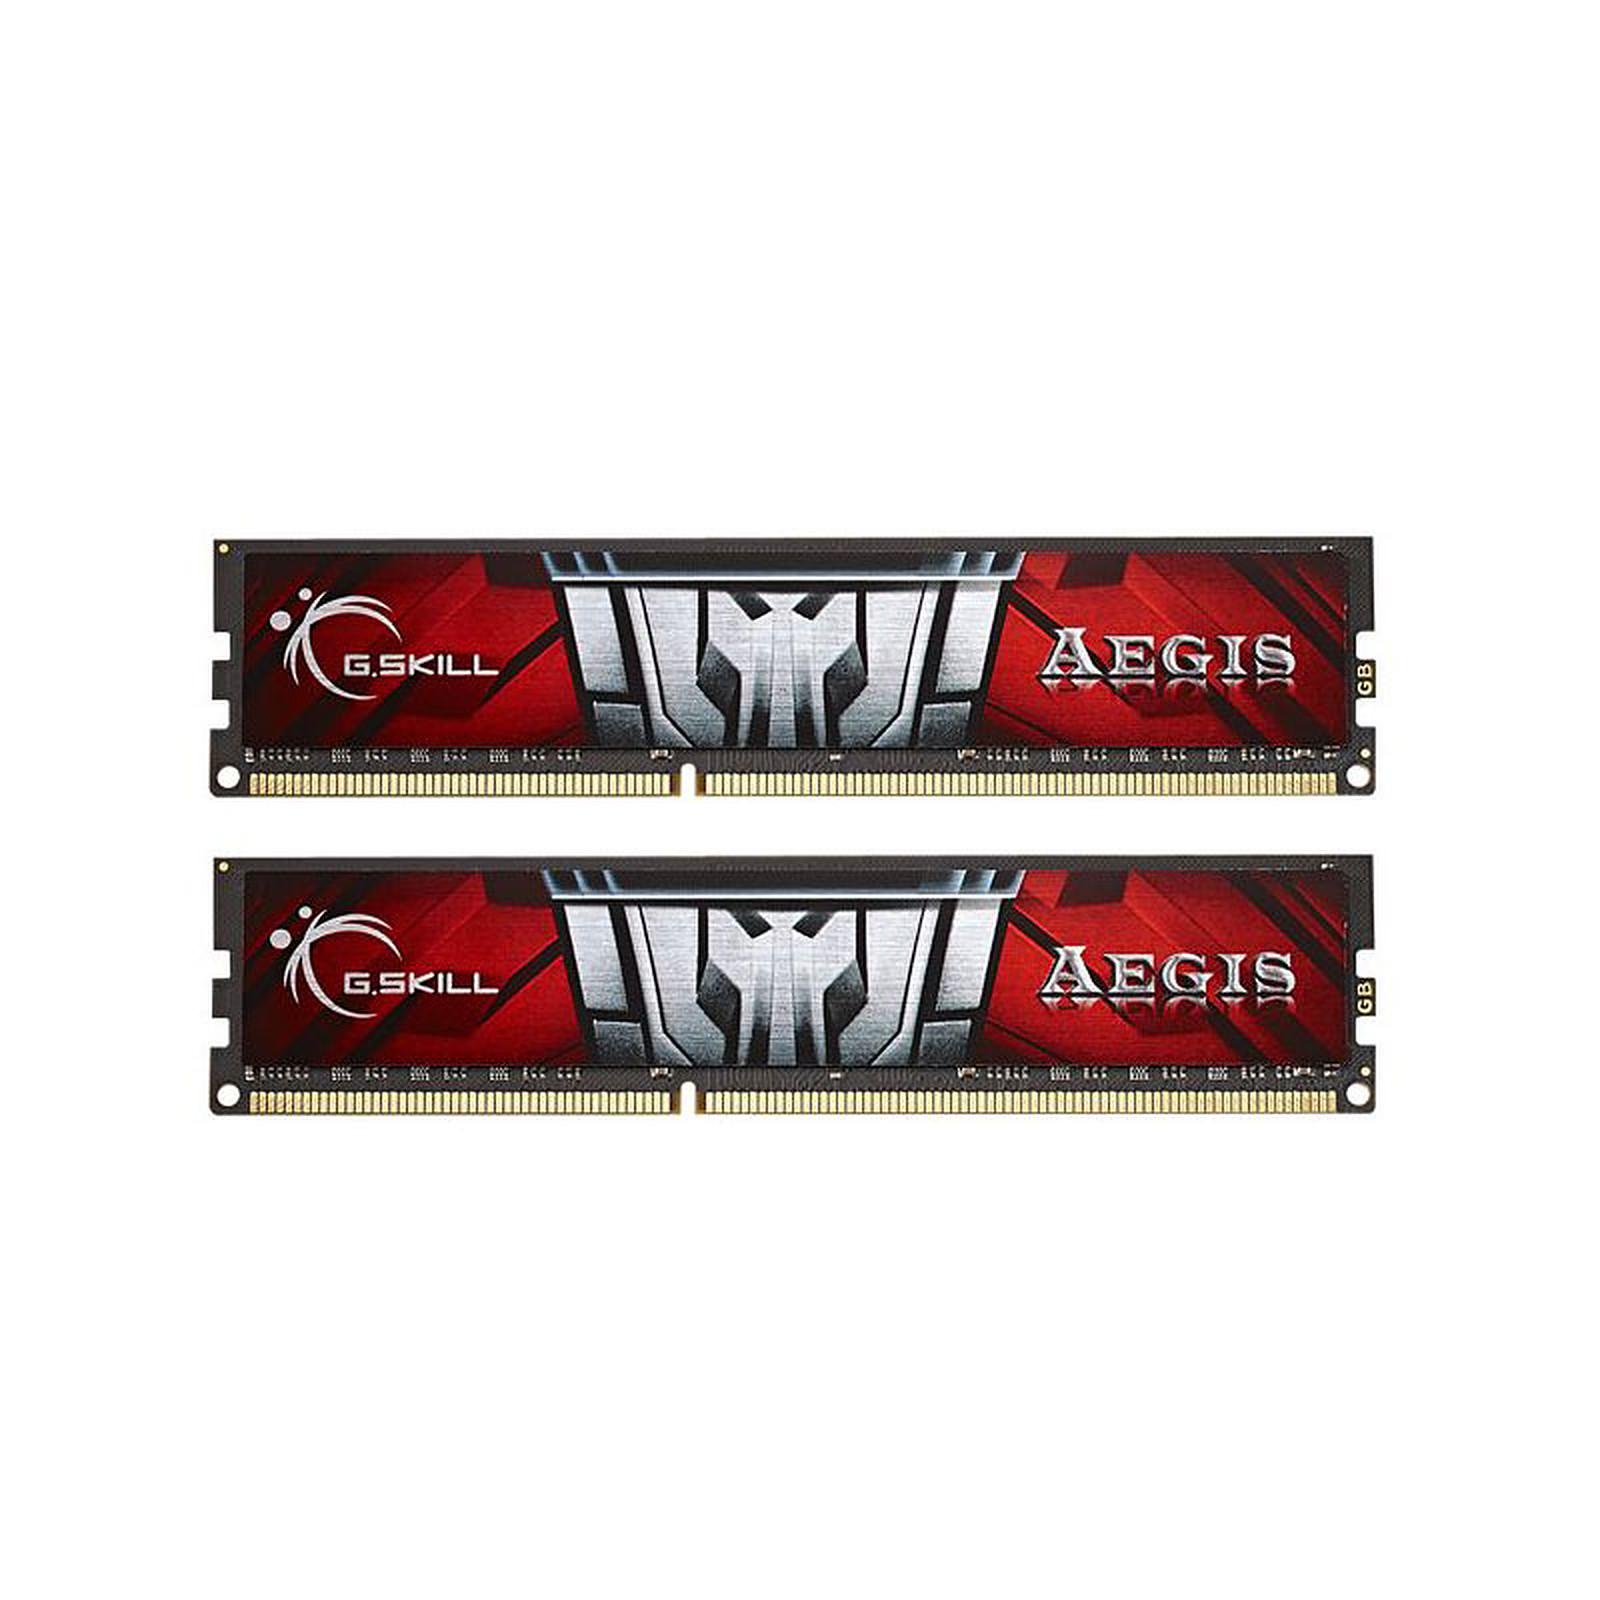 G.Skill Aegis Series 16 Go (2 x 8 Go) DDR3L 1600 MHz CL11